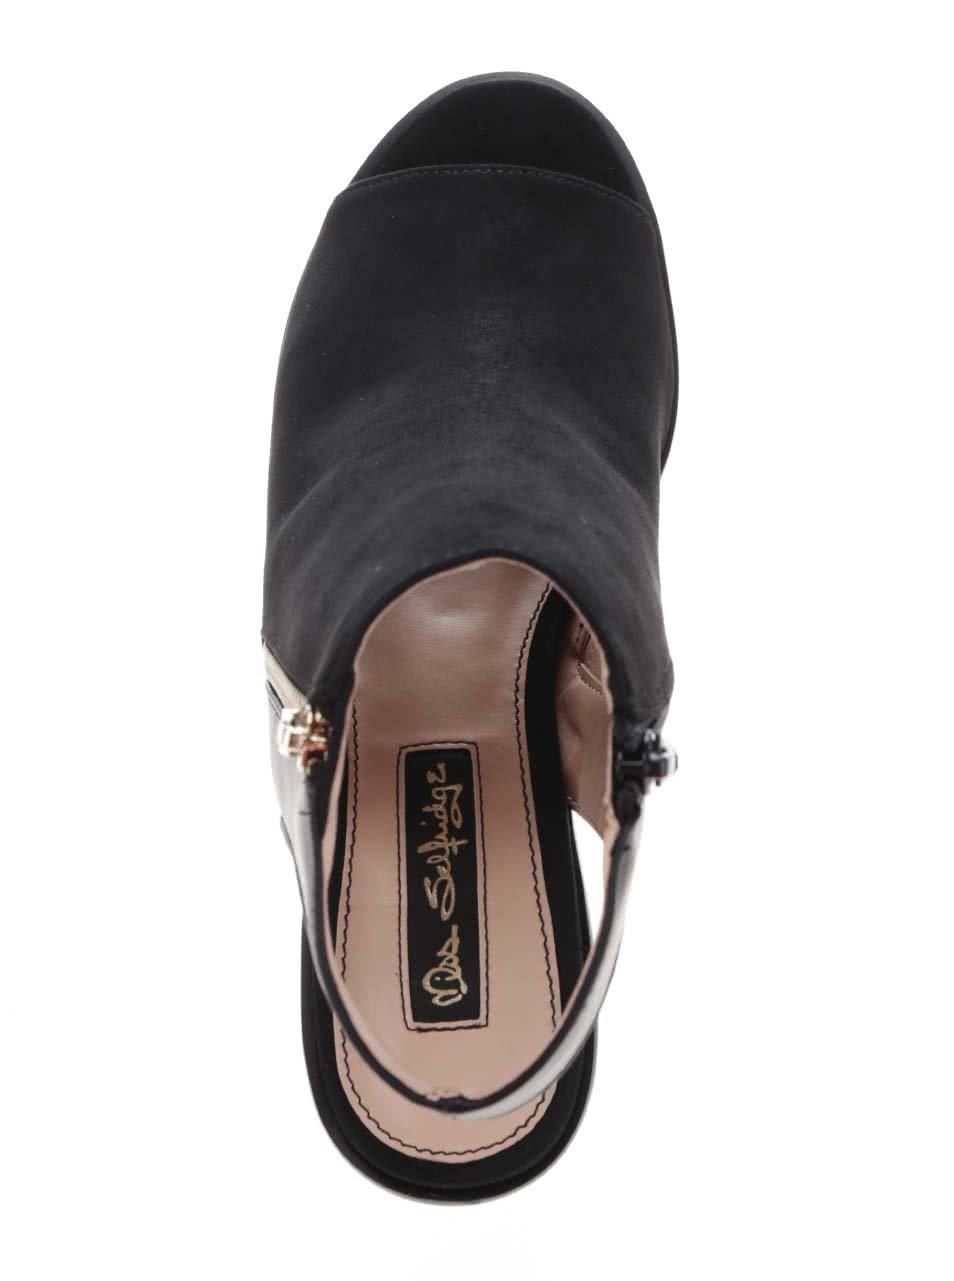 c3f8edb949 Čierne topánky s otvorenou špičkou a pätou v semišovej úprave Miss  Selfridge ...